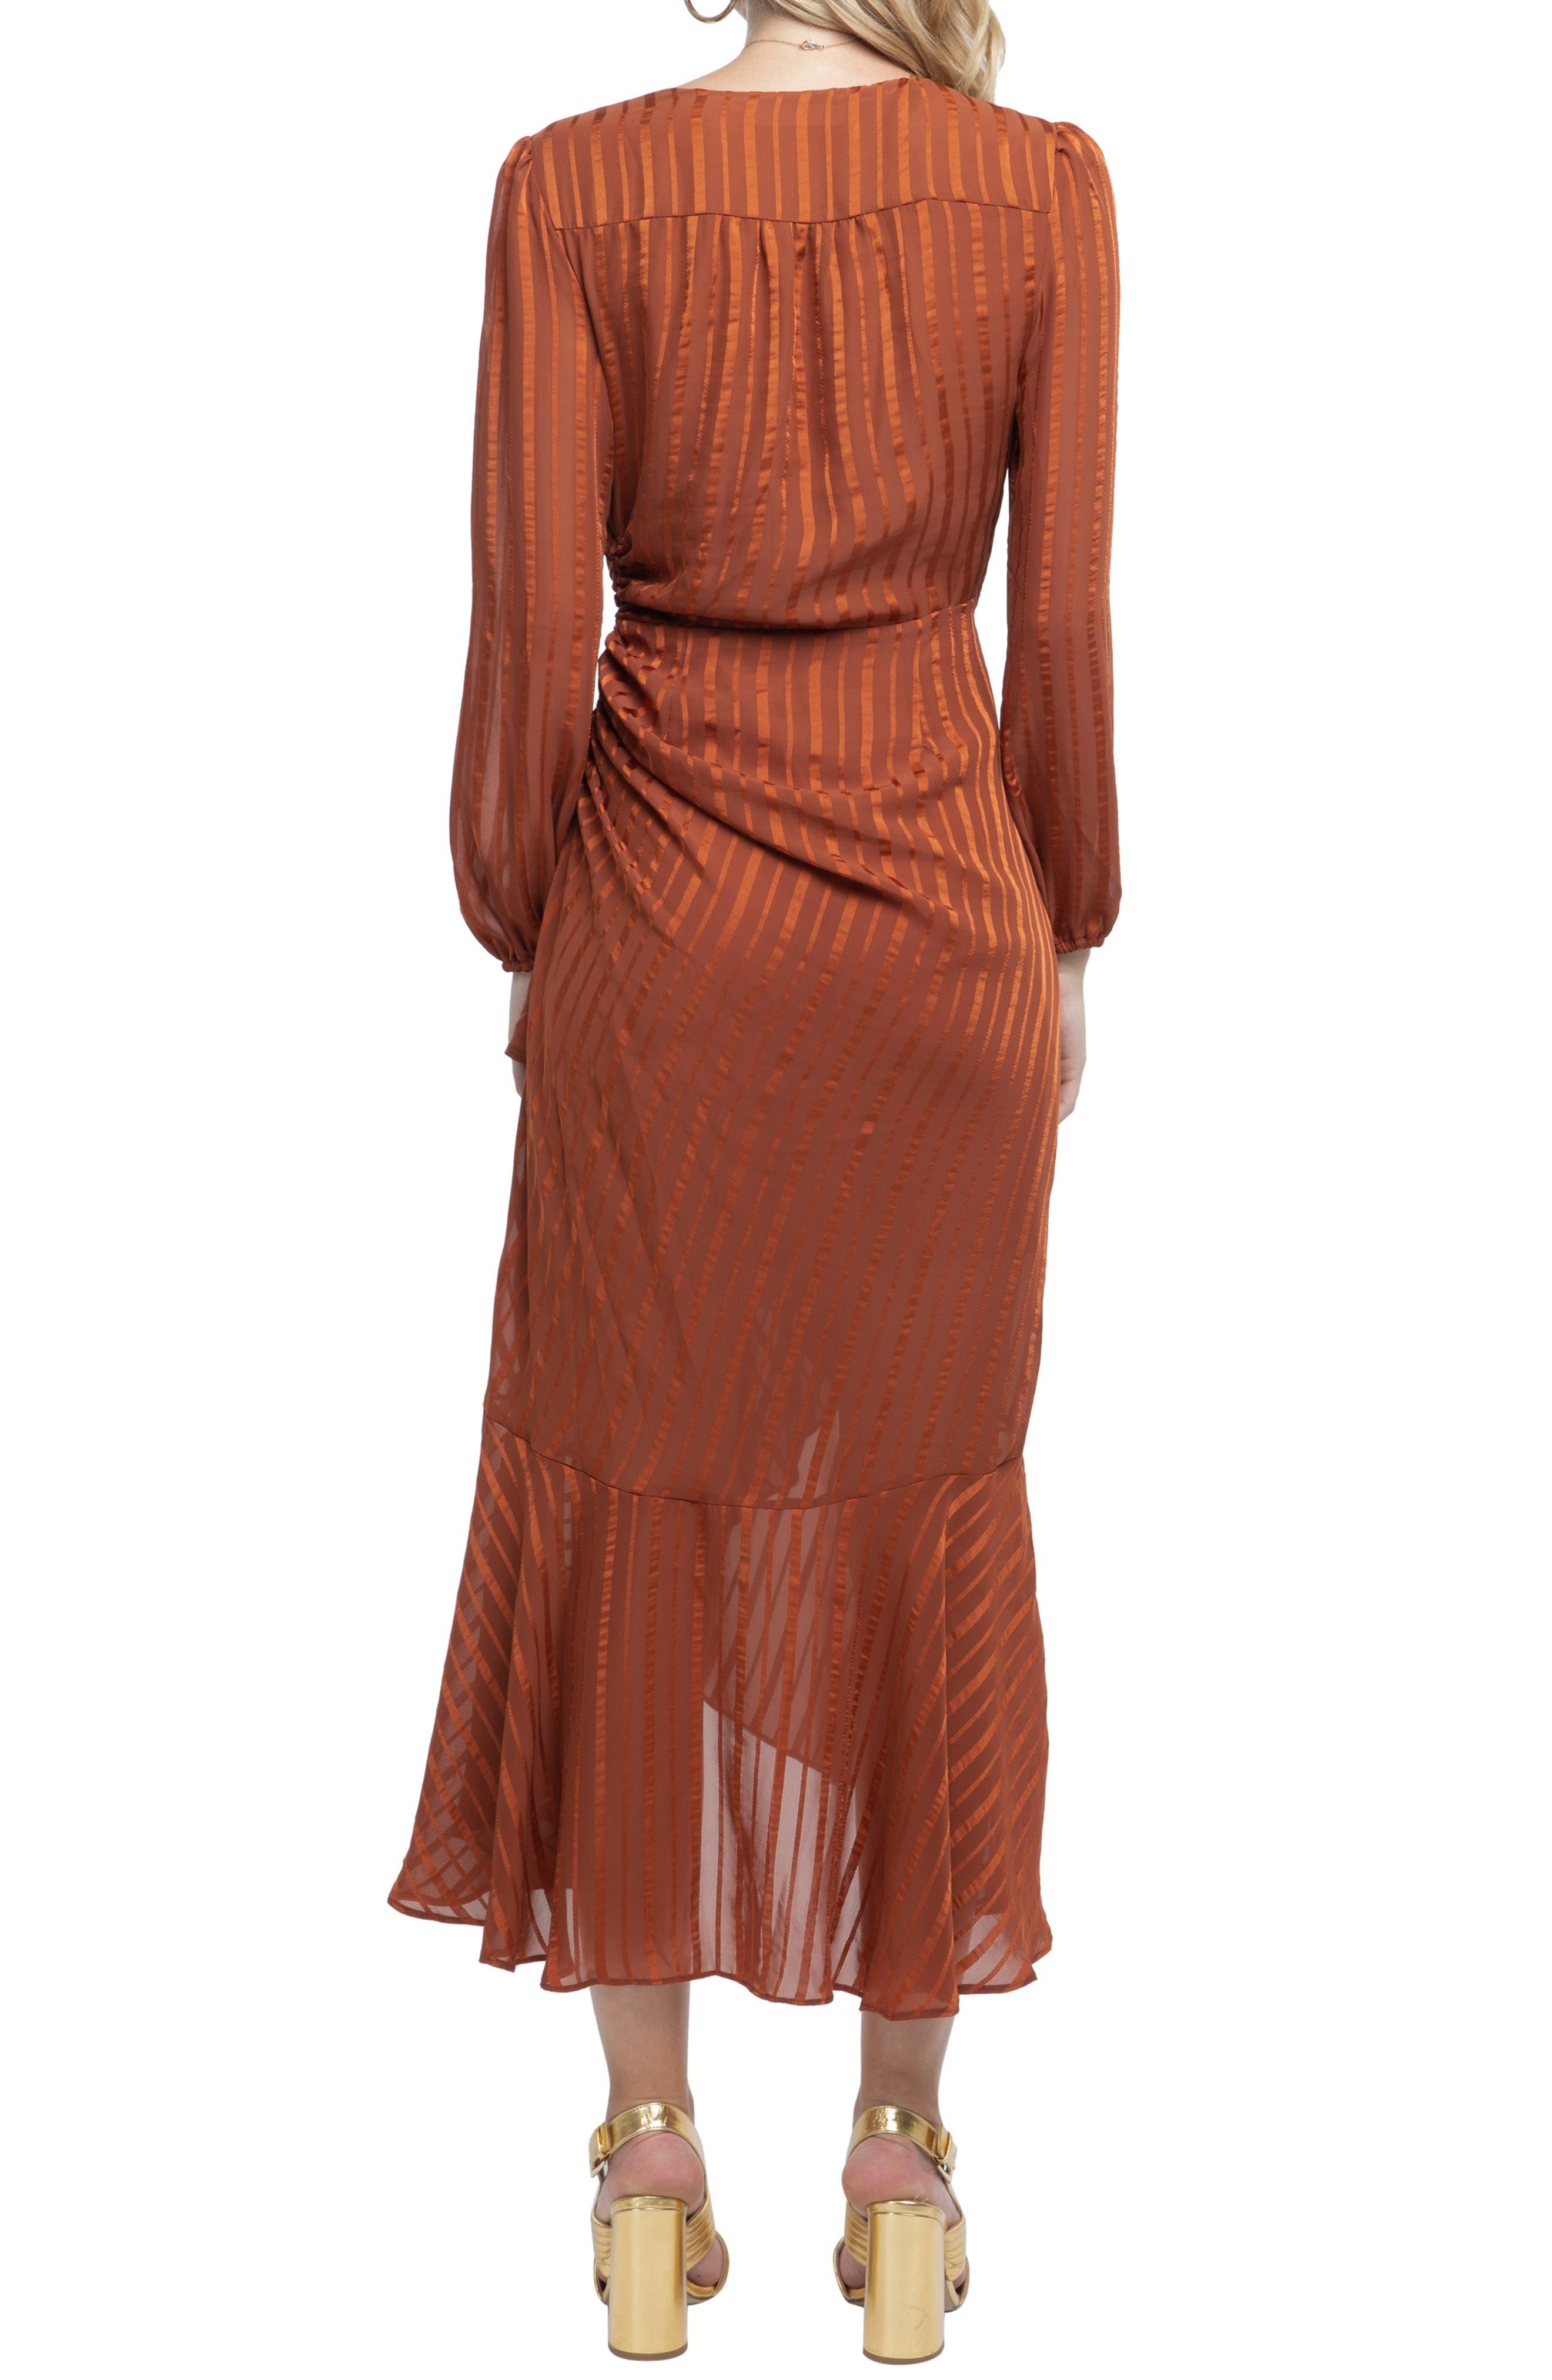 ASTR THE LABEL, Side Cinched Ruffle Hem Dress, Alternate thumbnail 2, color, 200